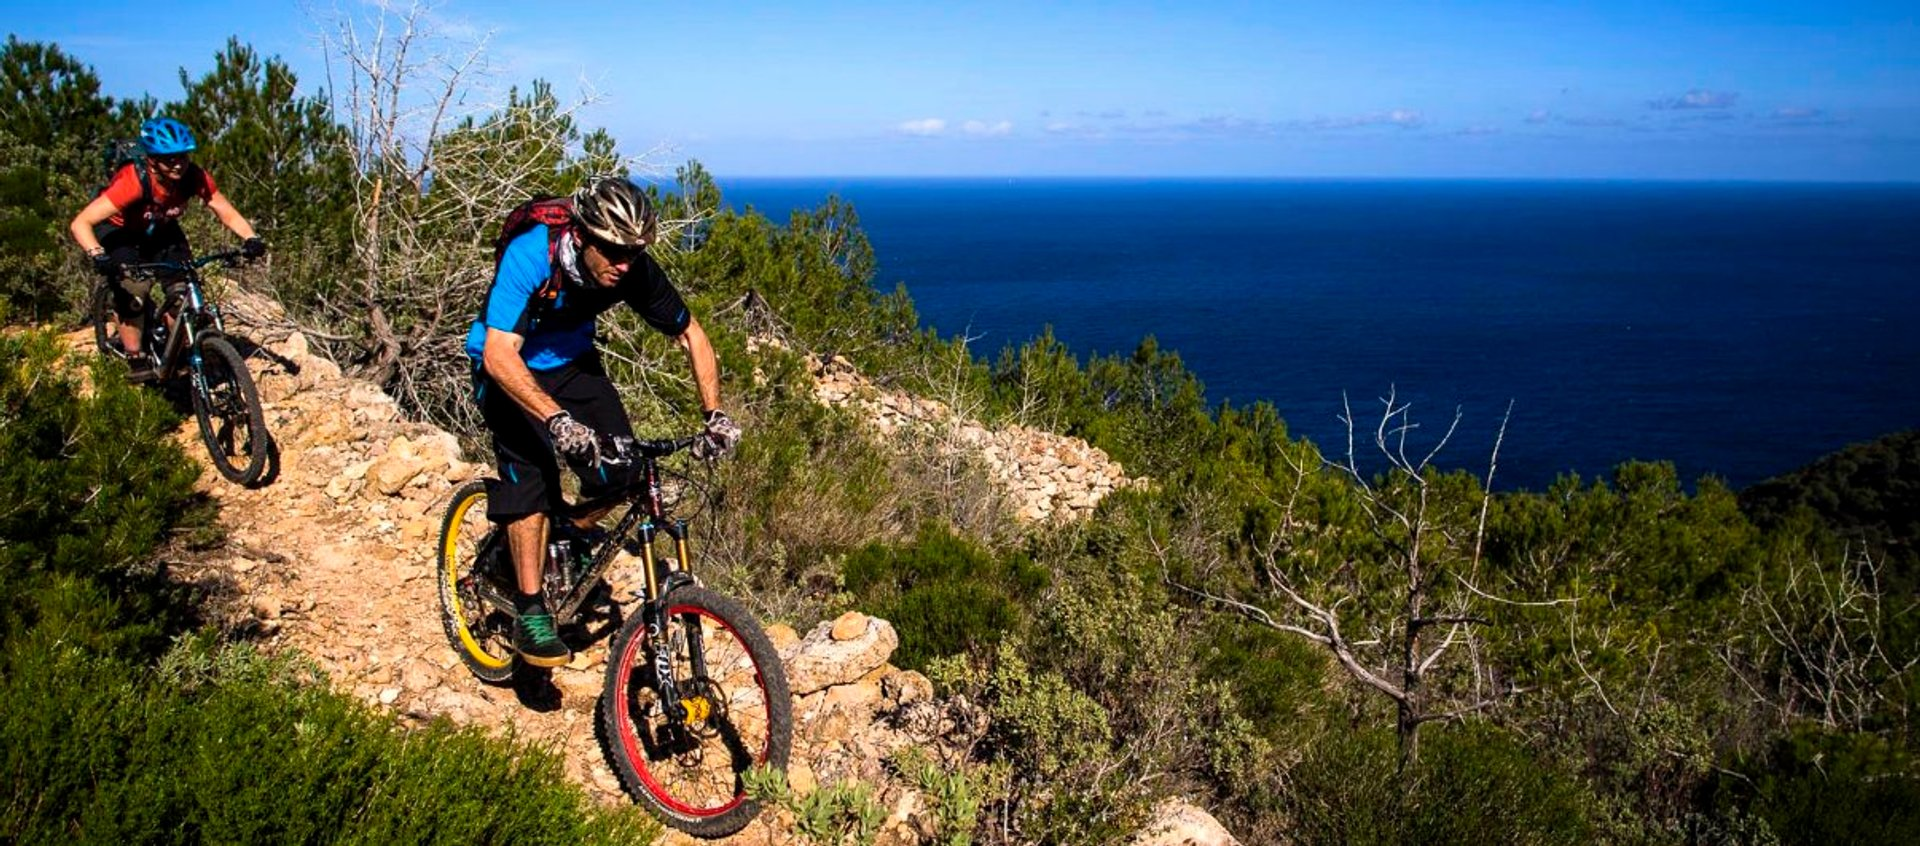 Mountain Biking in Ibiza 2020 - Best Time